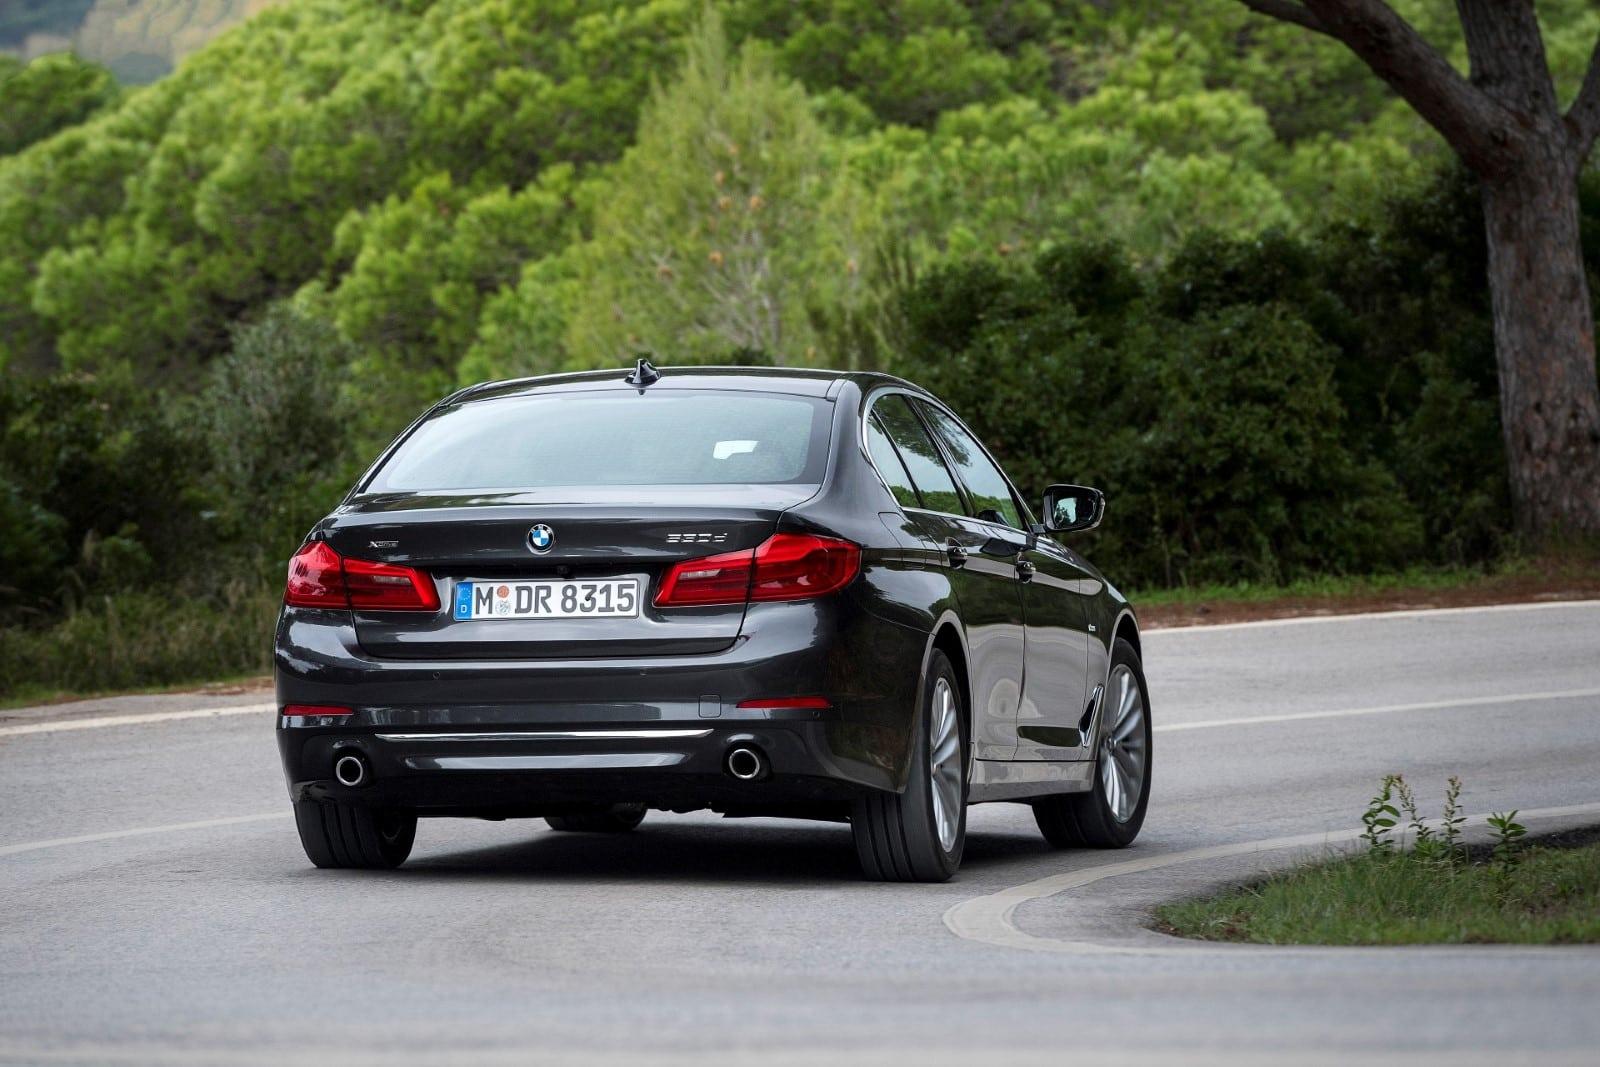 BMW 5 Series G30 2017 530d xDrive Sedan Luxury Line